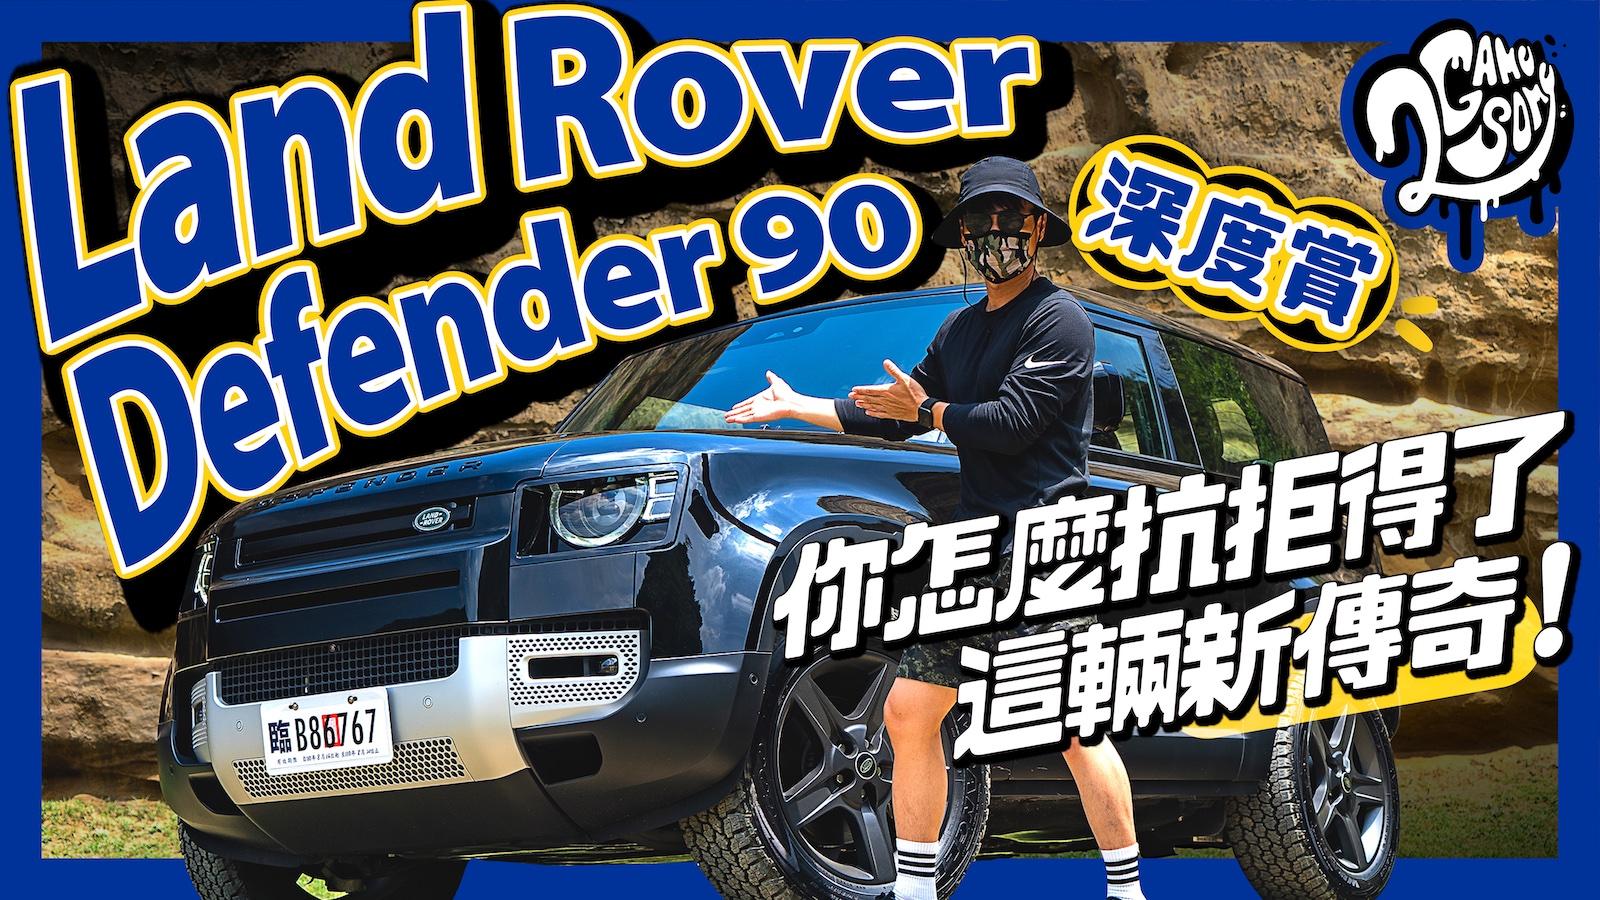 ▲ Land Rover Defender 90 深度賞 所有面向完整解析!你怎麼抗拒得了這輛新傳奇!